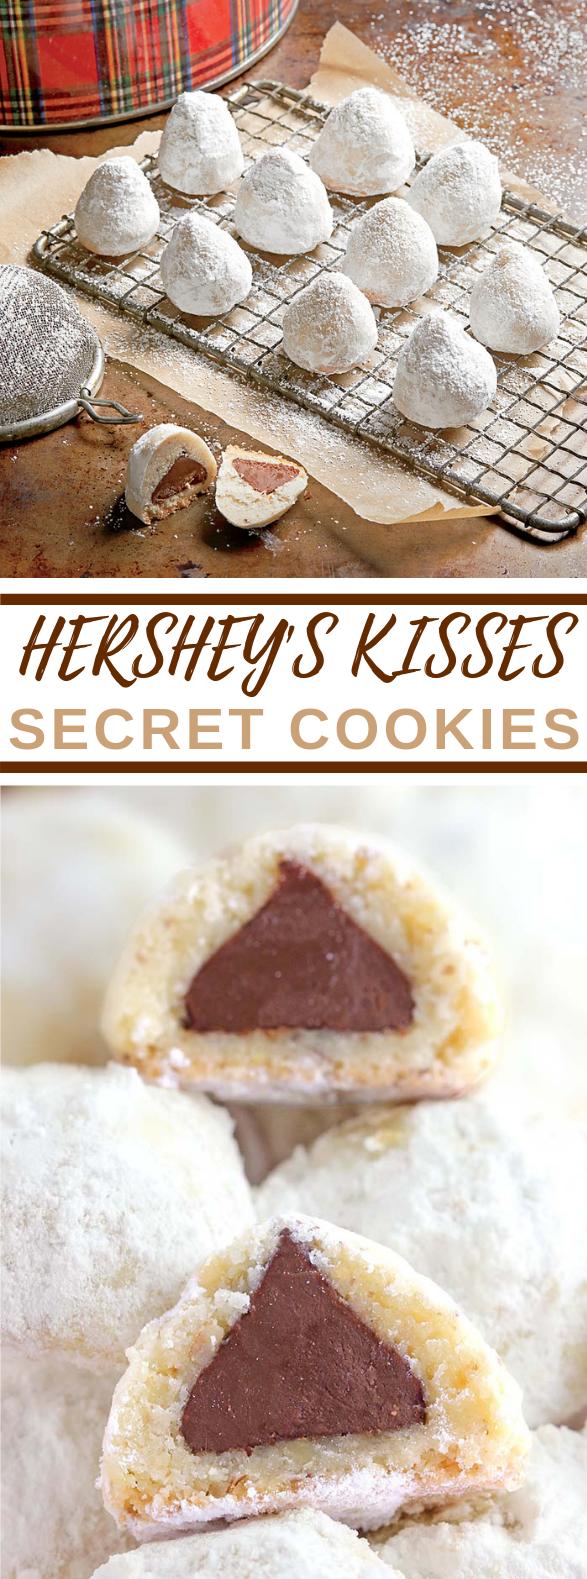 Hershey's Secret Kisses Cookies #desserts #valentineday